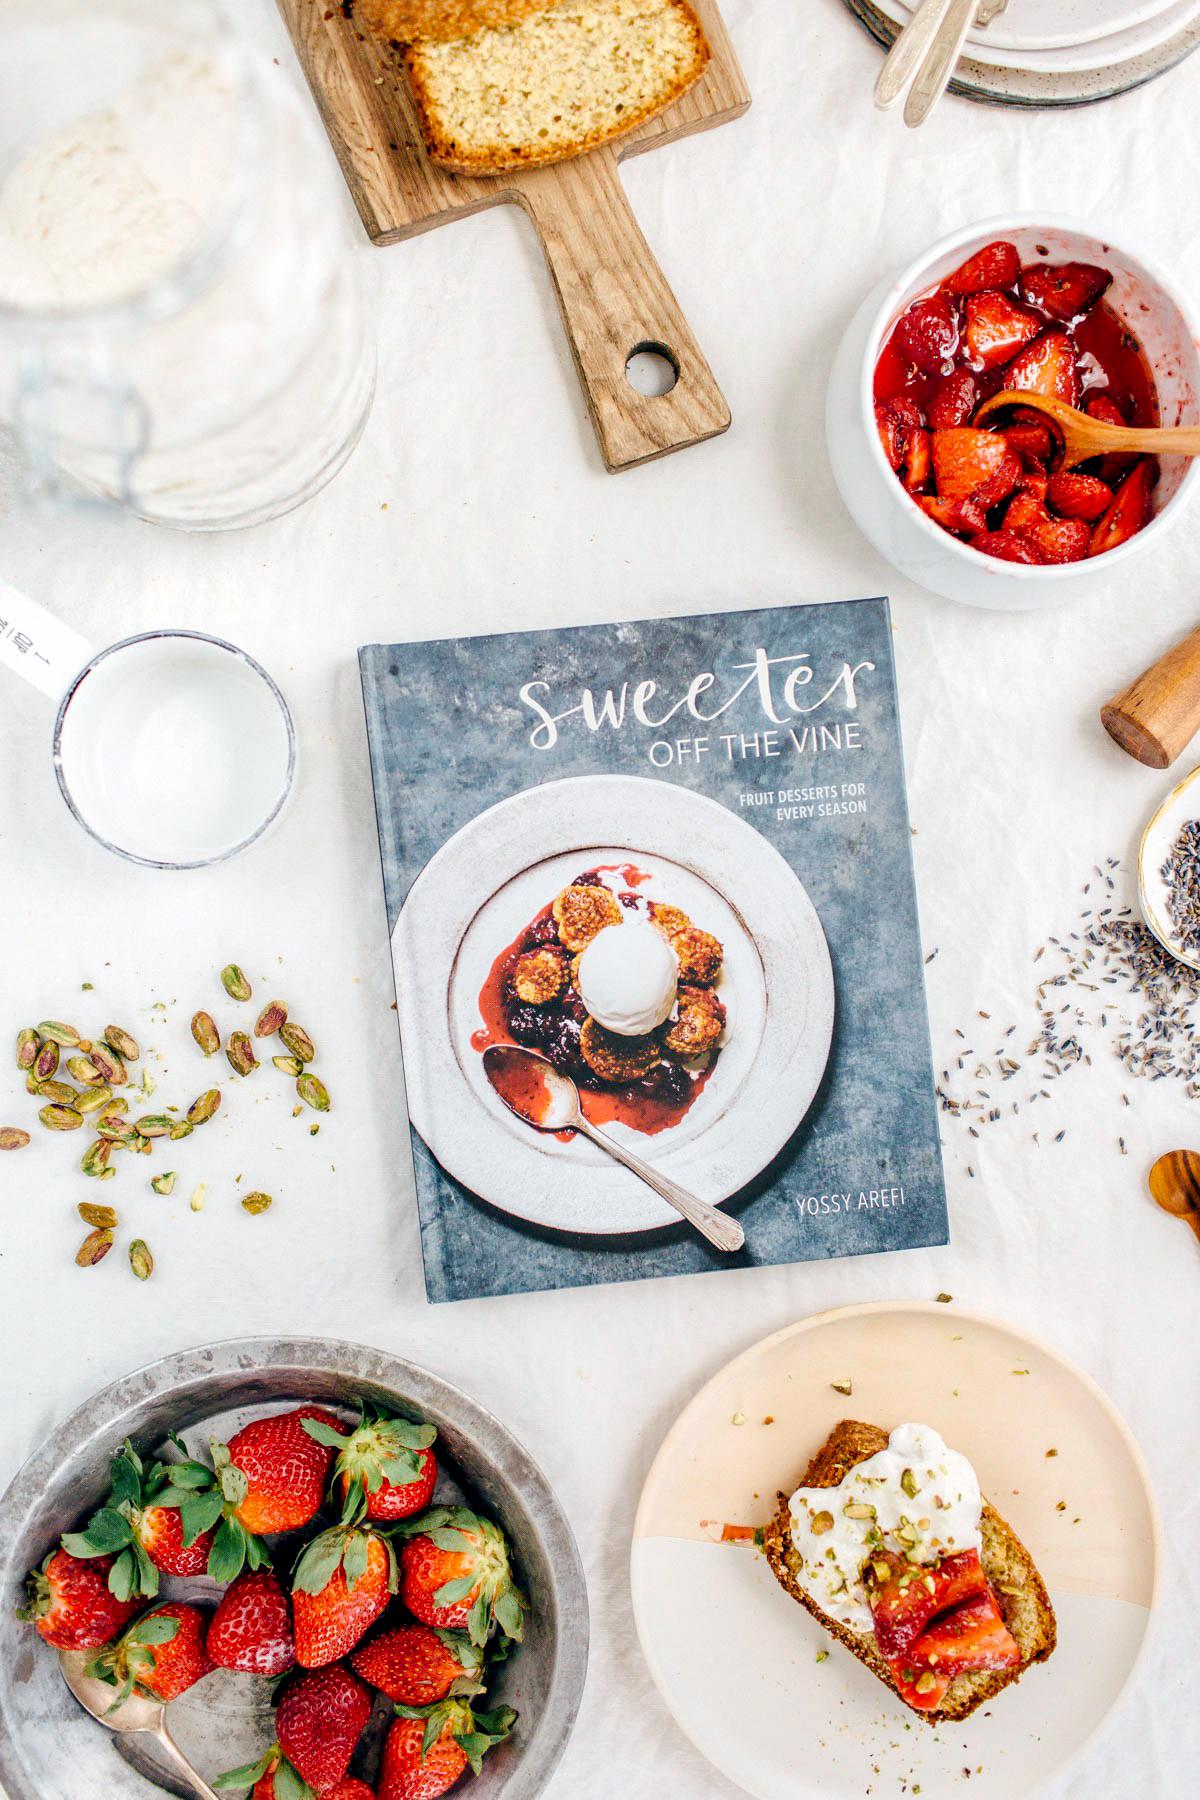 Pistachio Pound Cake with Strawberries in Lavender Sugar